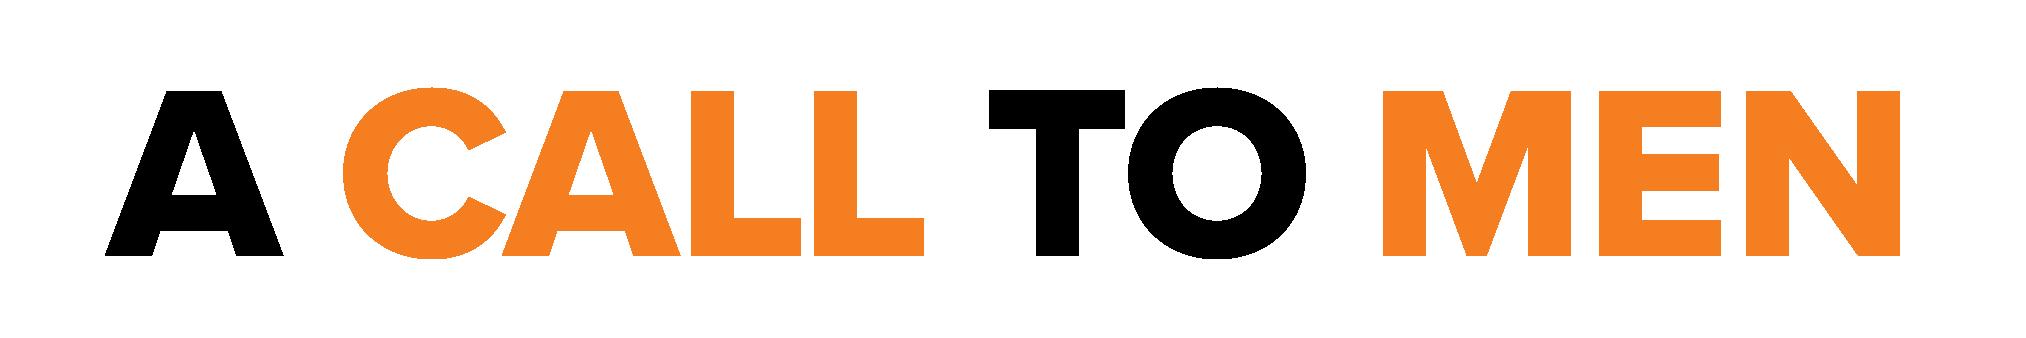 ACTM-Logo2.0-Horiz-Color(3).png